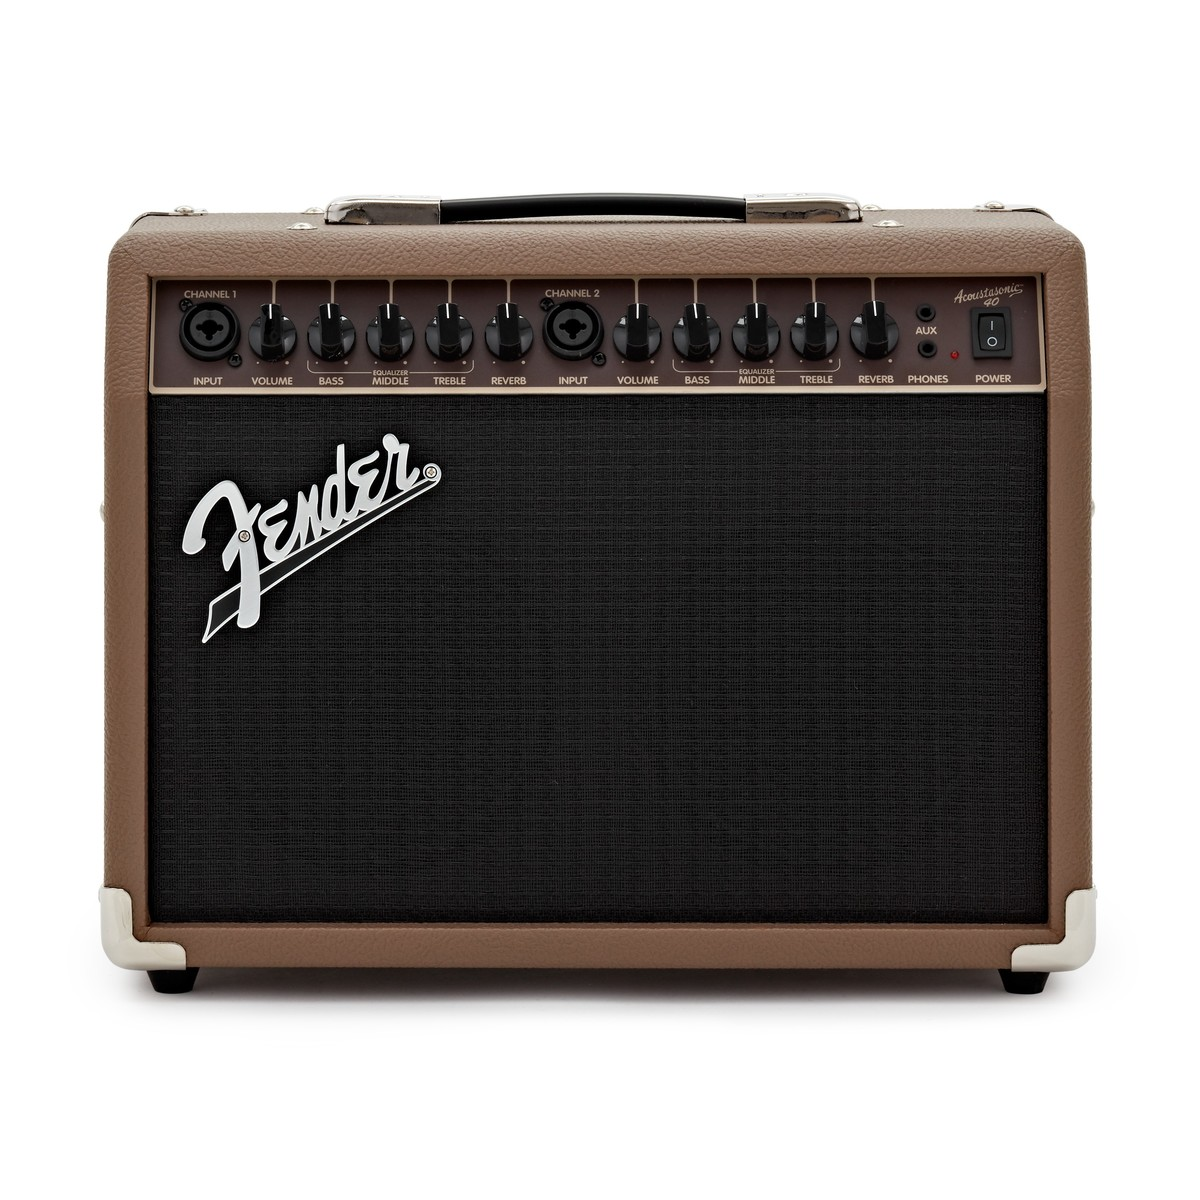 Fender Acoustsonic 40 Acoustic Amp